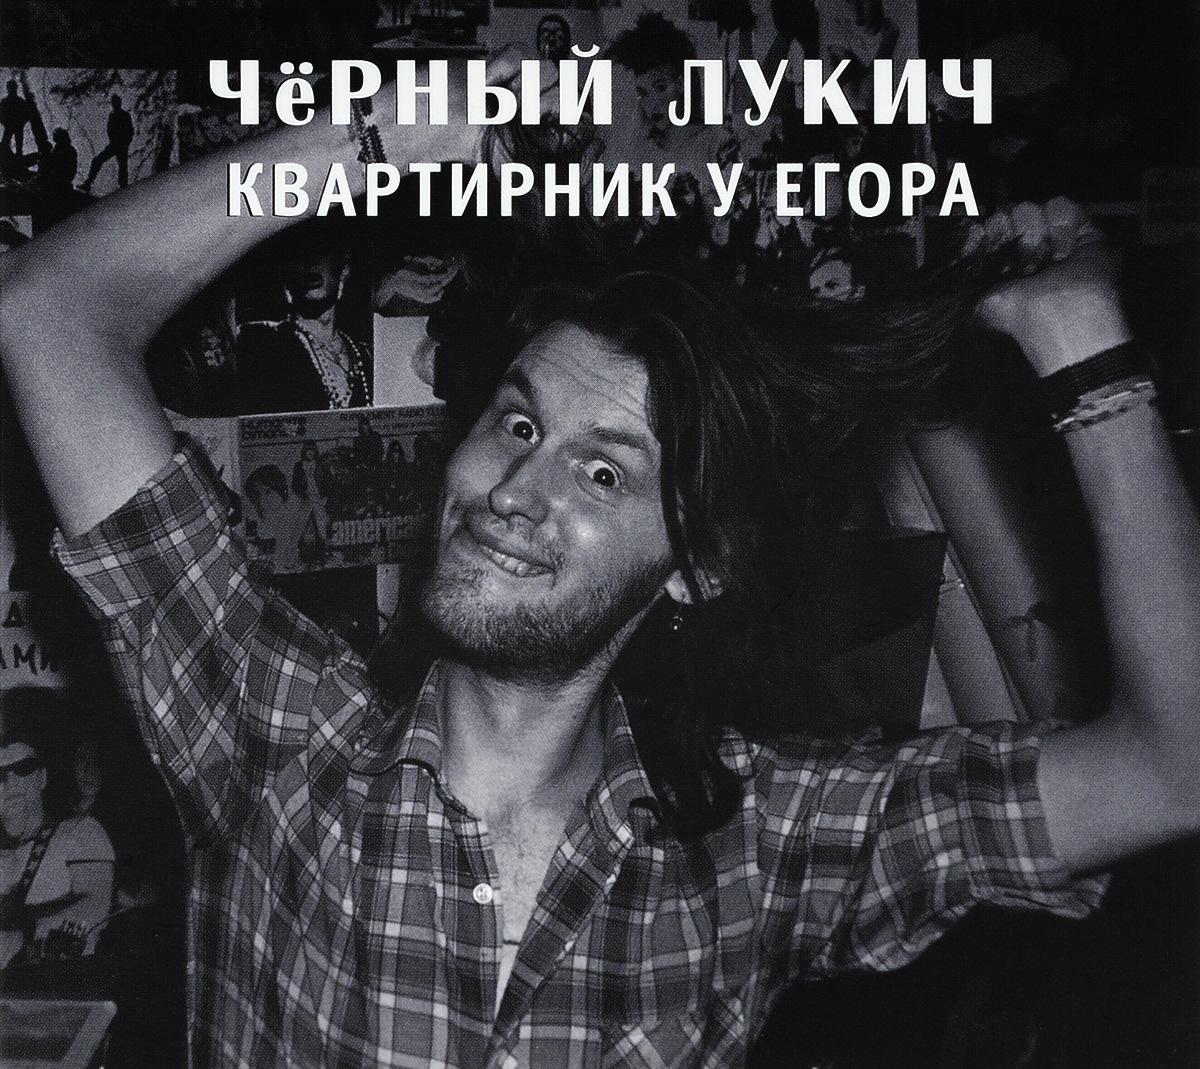 Черный Лукич Черный Лукич. Квартирник у Егора владислав бородин квартирник